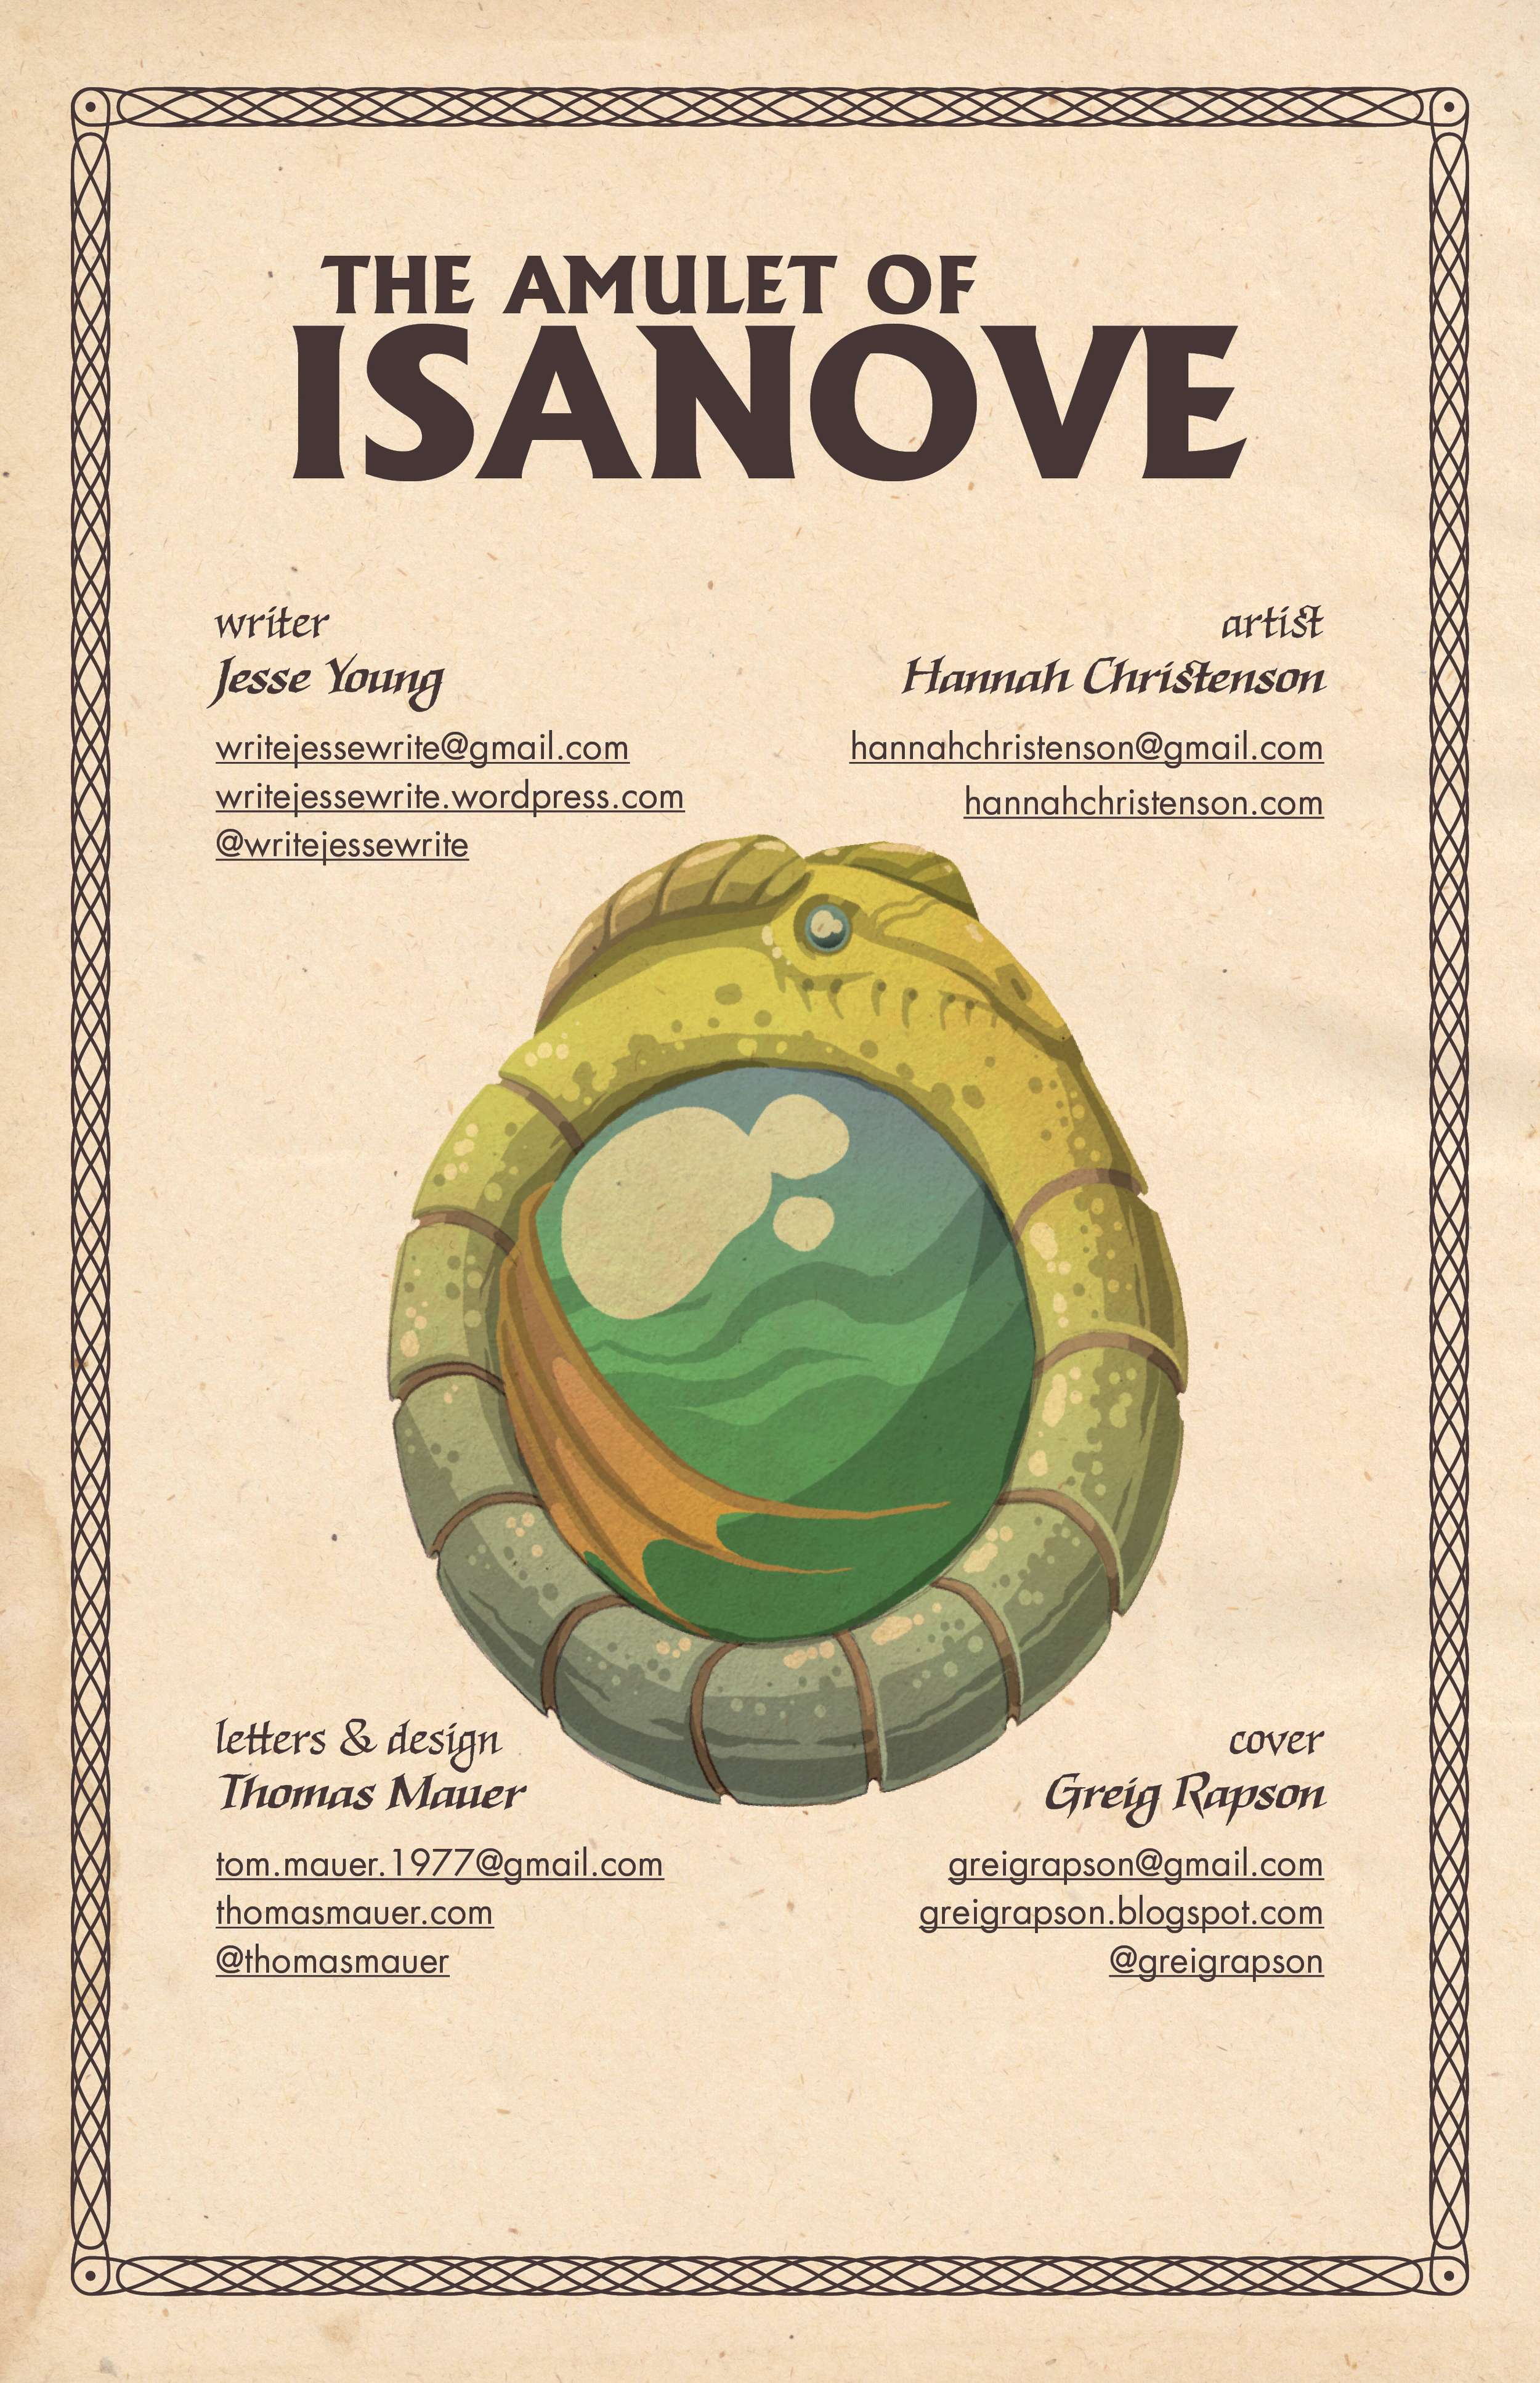 amulet-of-isanove-COV-02.jpg